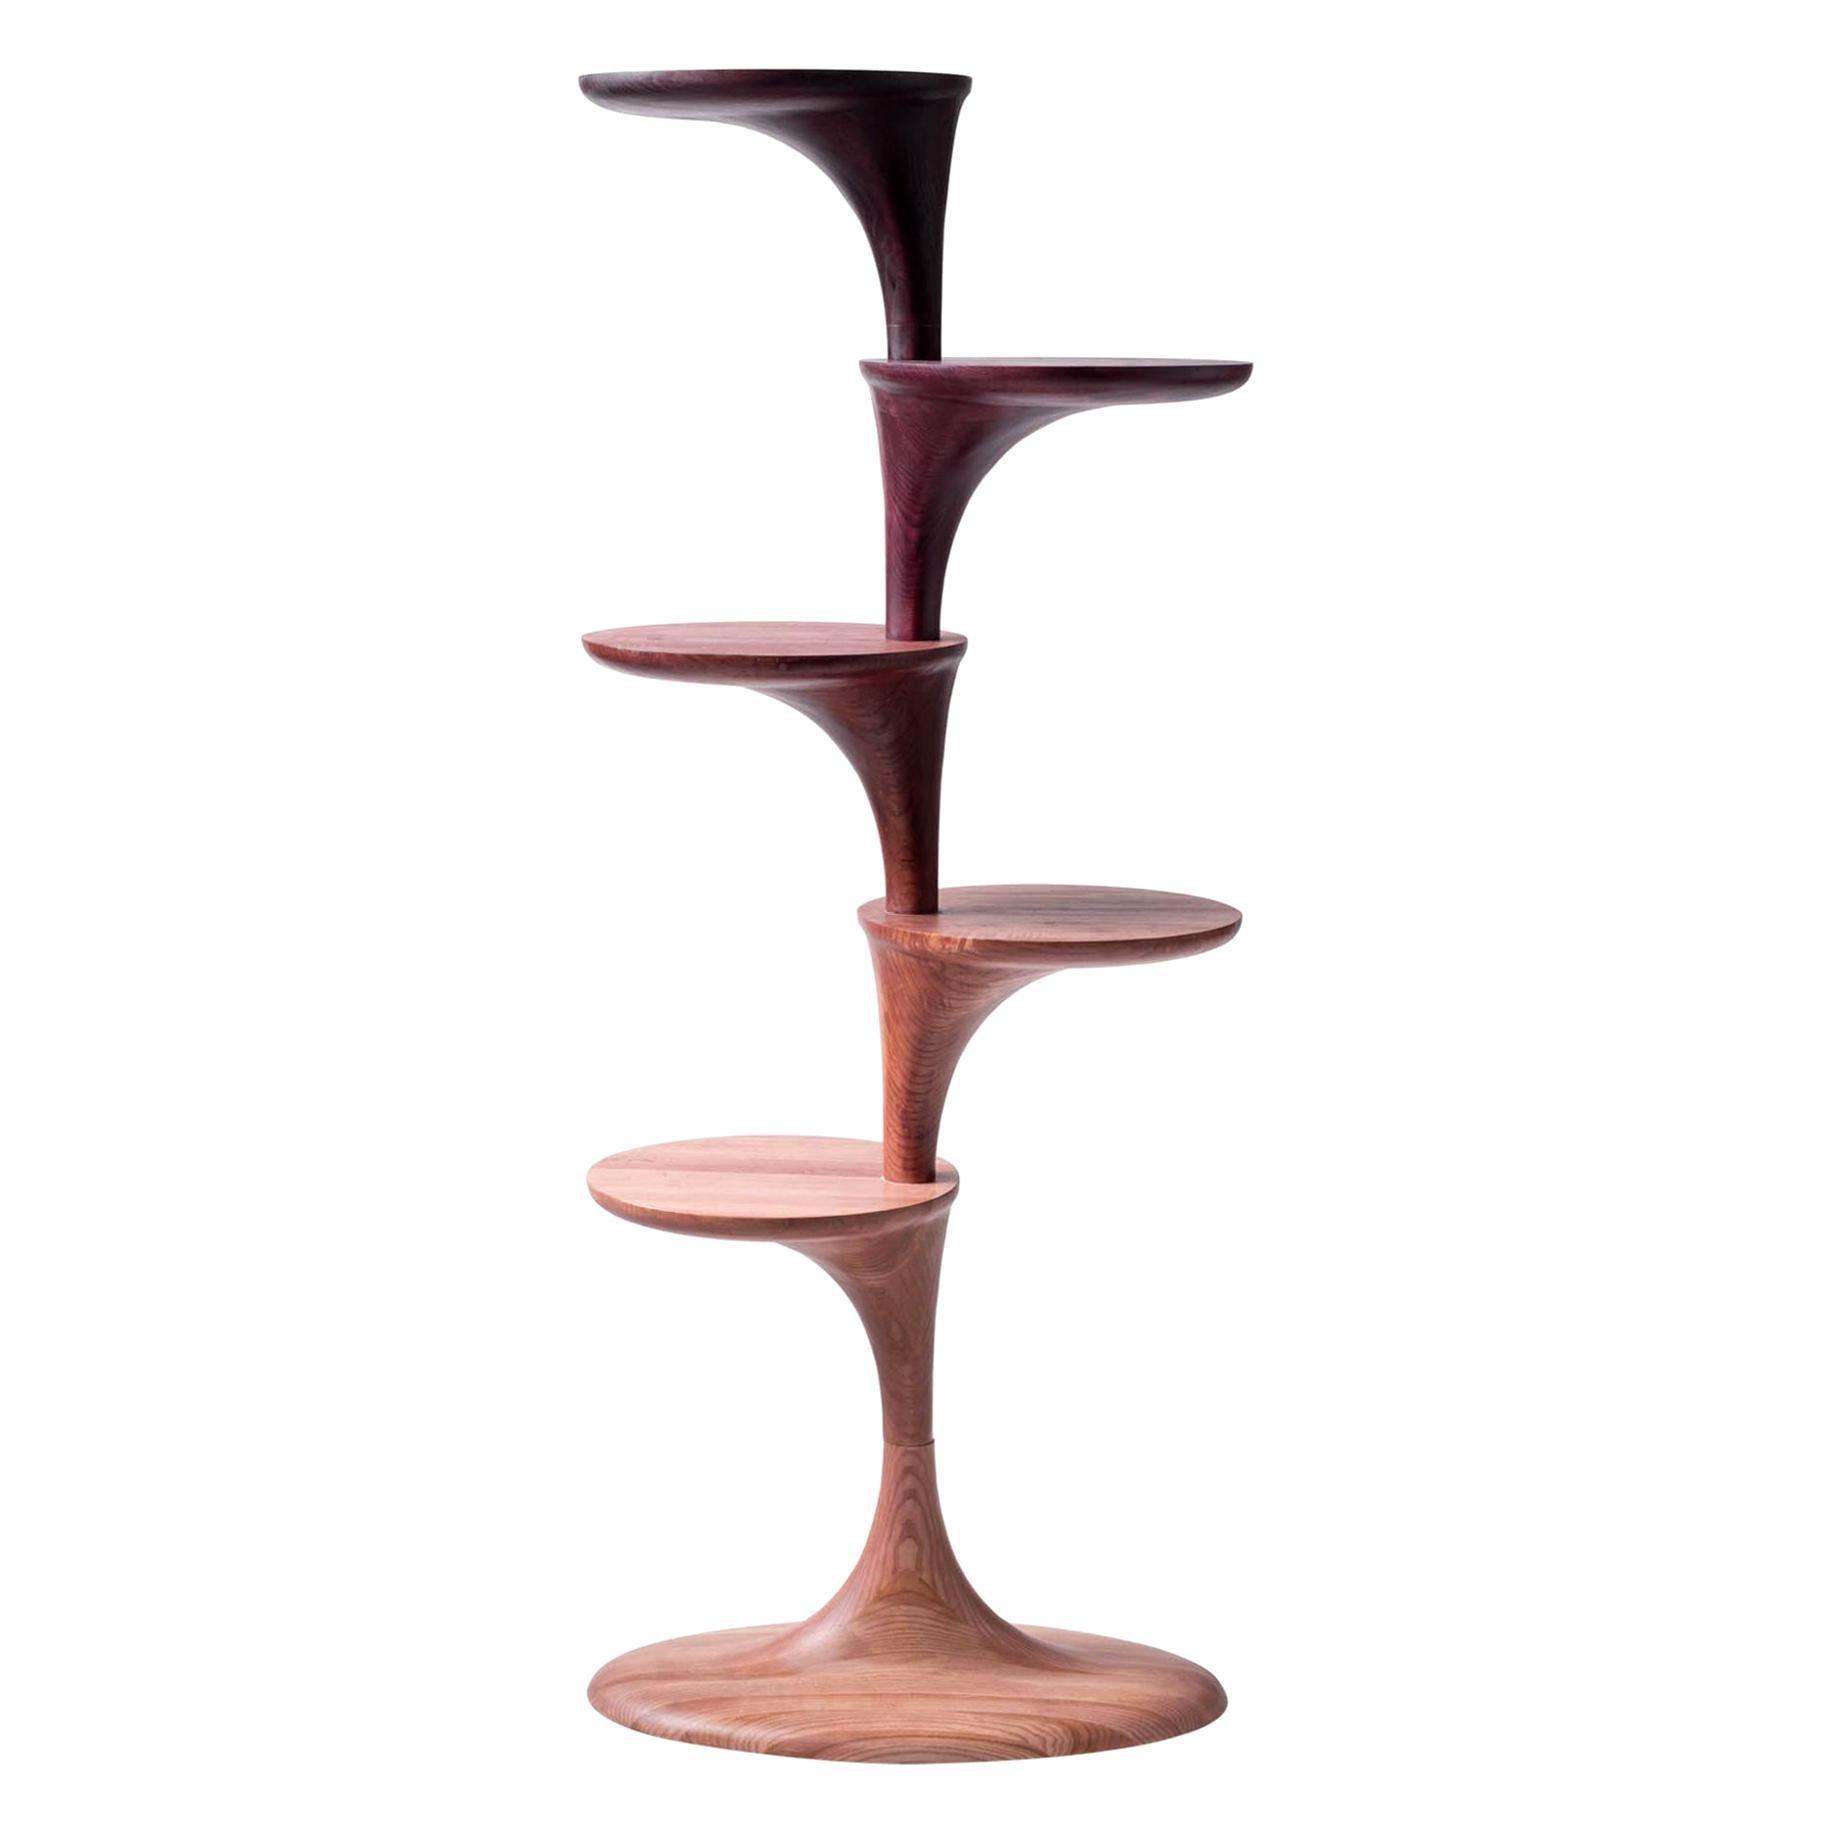 """Modular Shelf"" from the Cursive Collection by Studio Artist Adam Zimmerman."